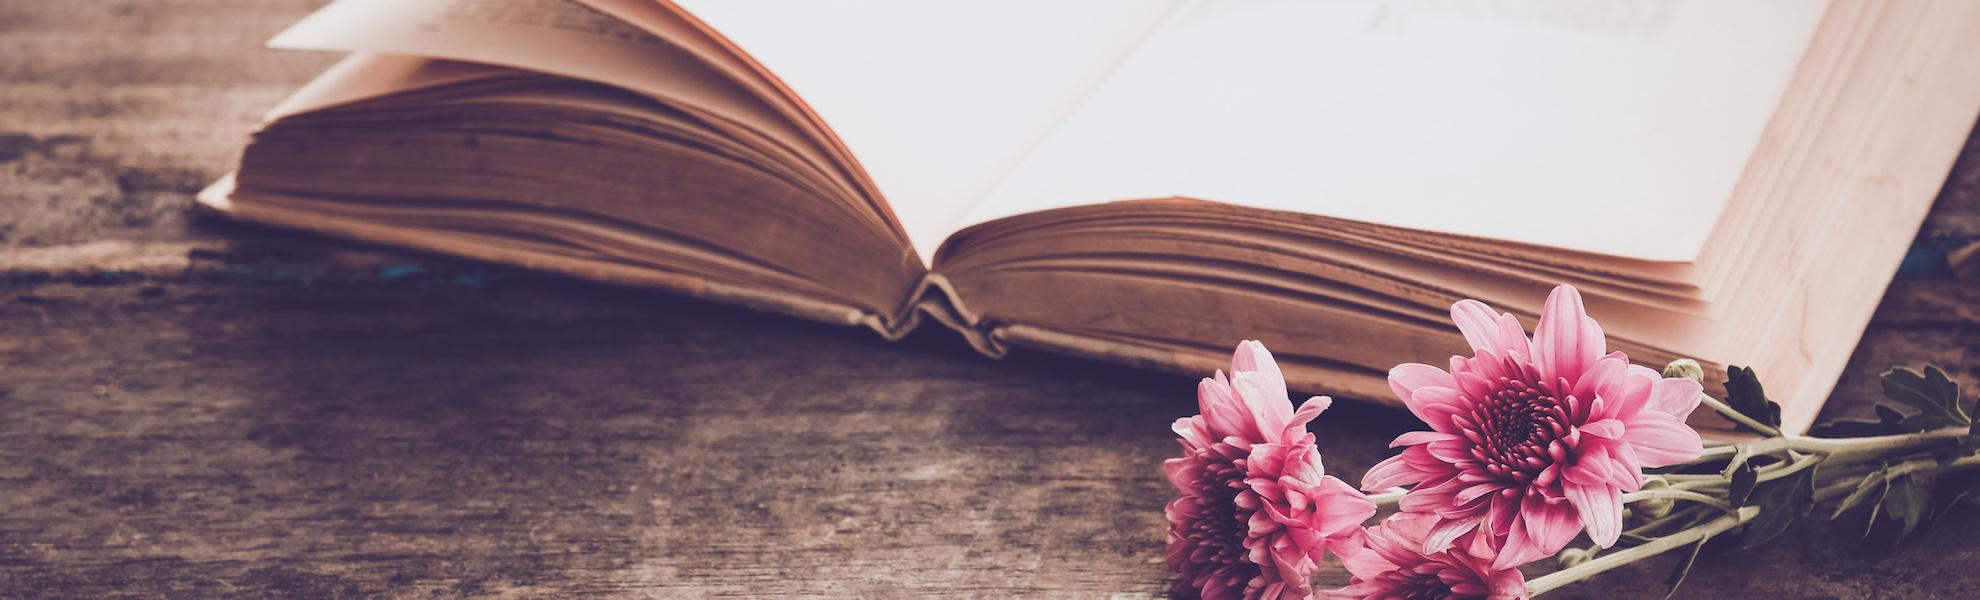 Frühling-Buch-Blumen-Holzbank